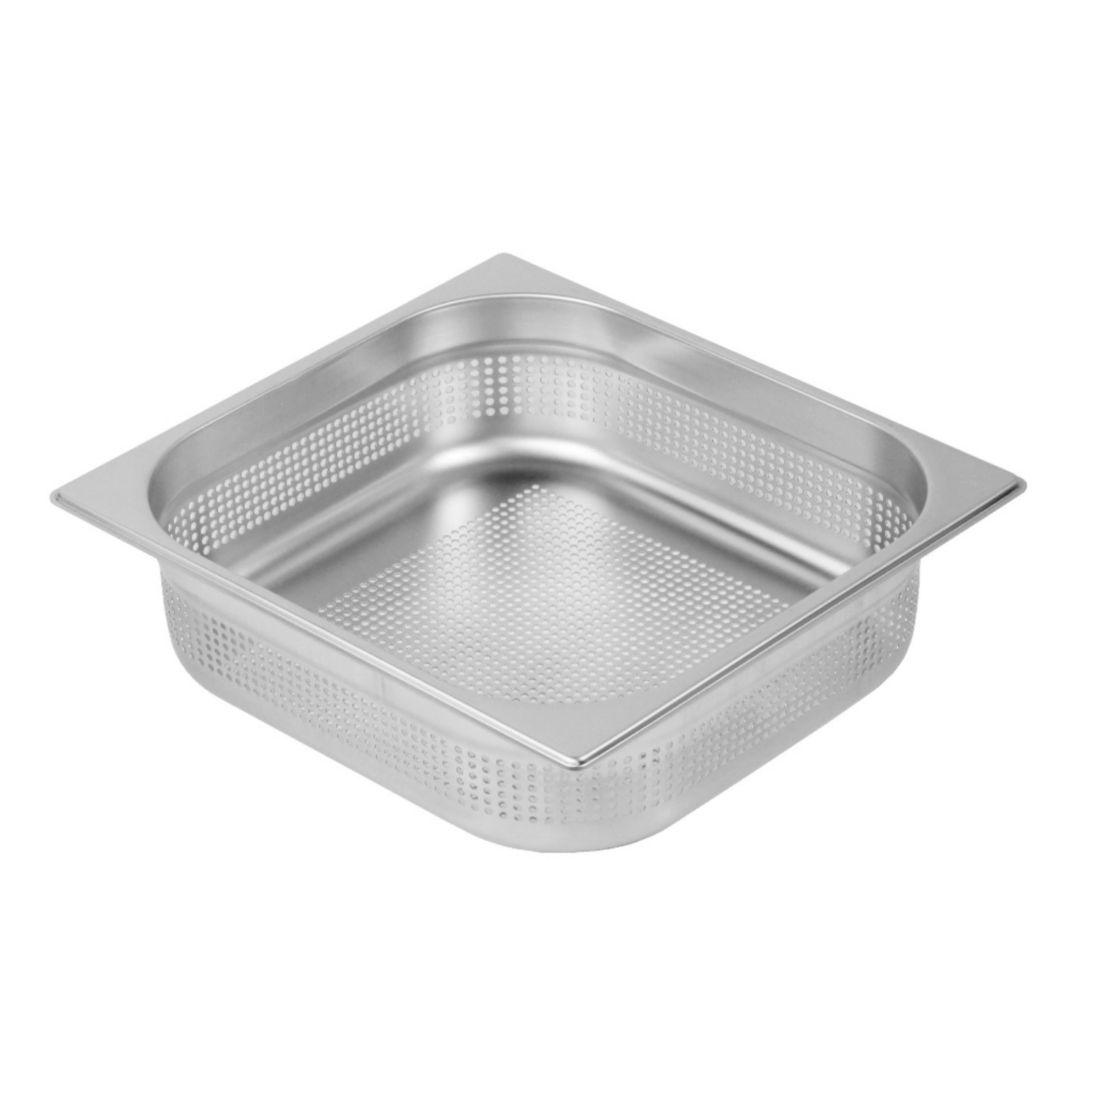 Gastronádoba Profi děrovaná GN 2/3 200 mm